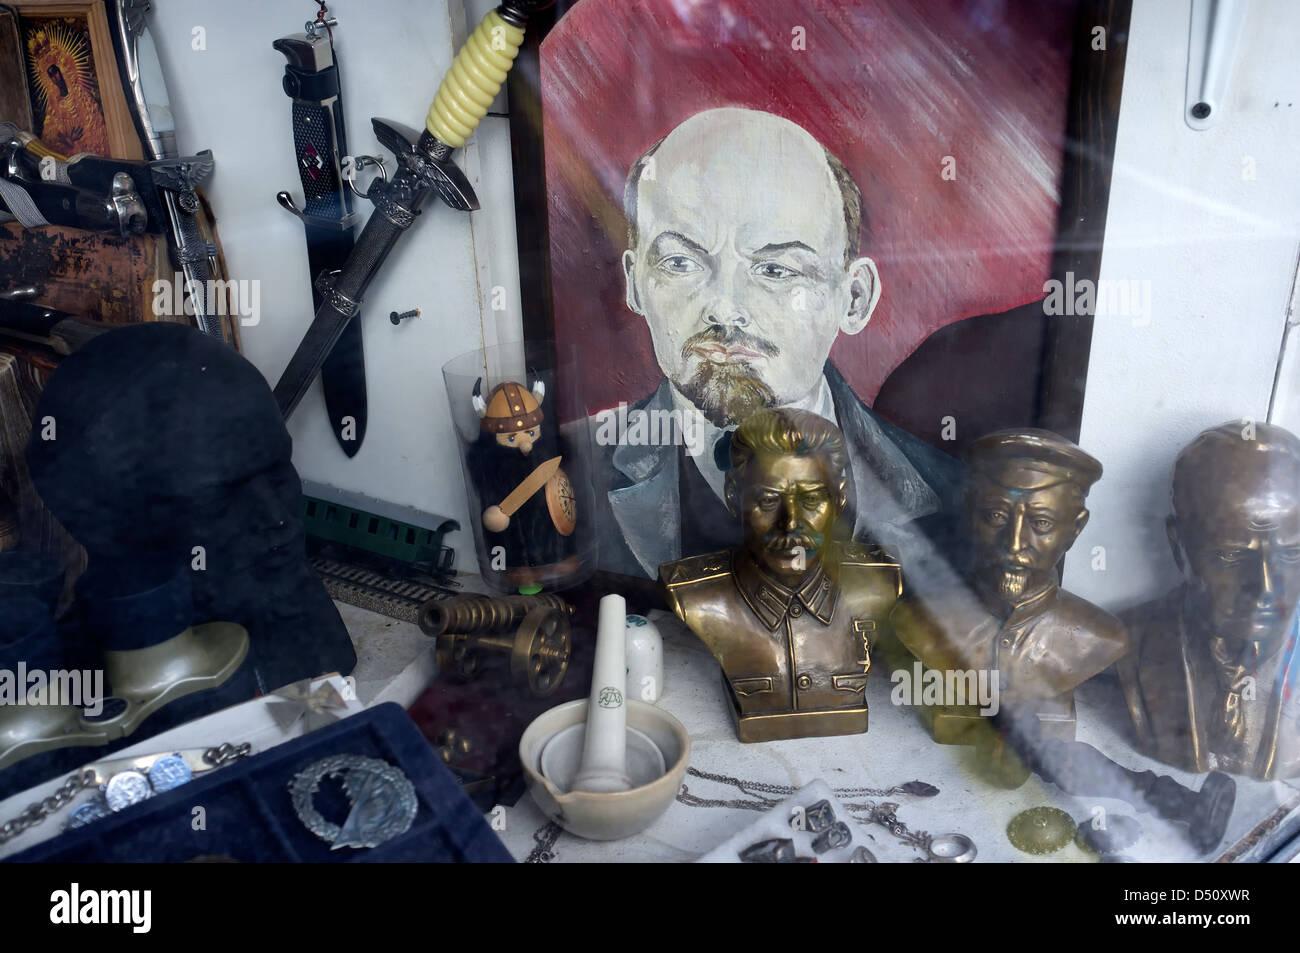 Tallinn, Estonia, flea market booth at the Russian market with communist memorabilia - Stock Image